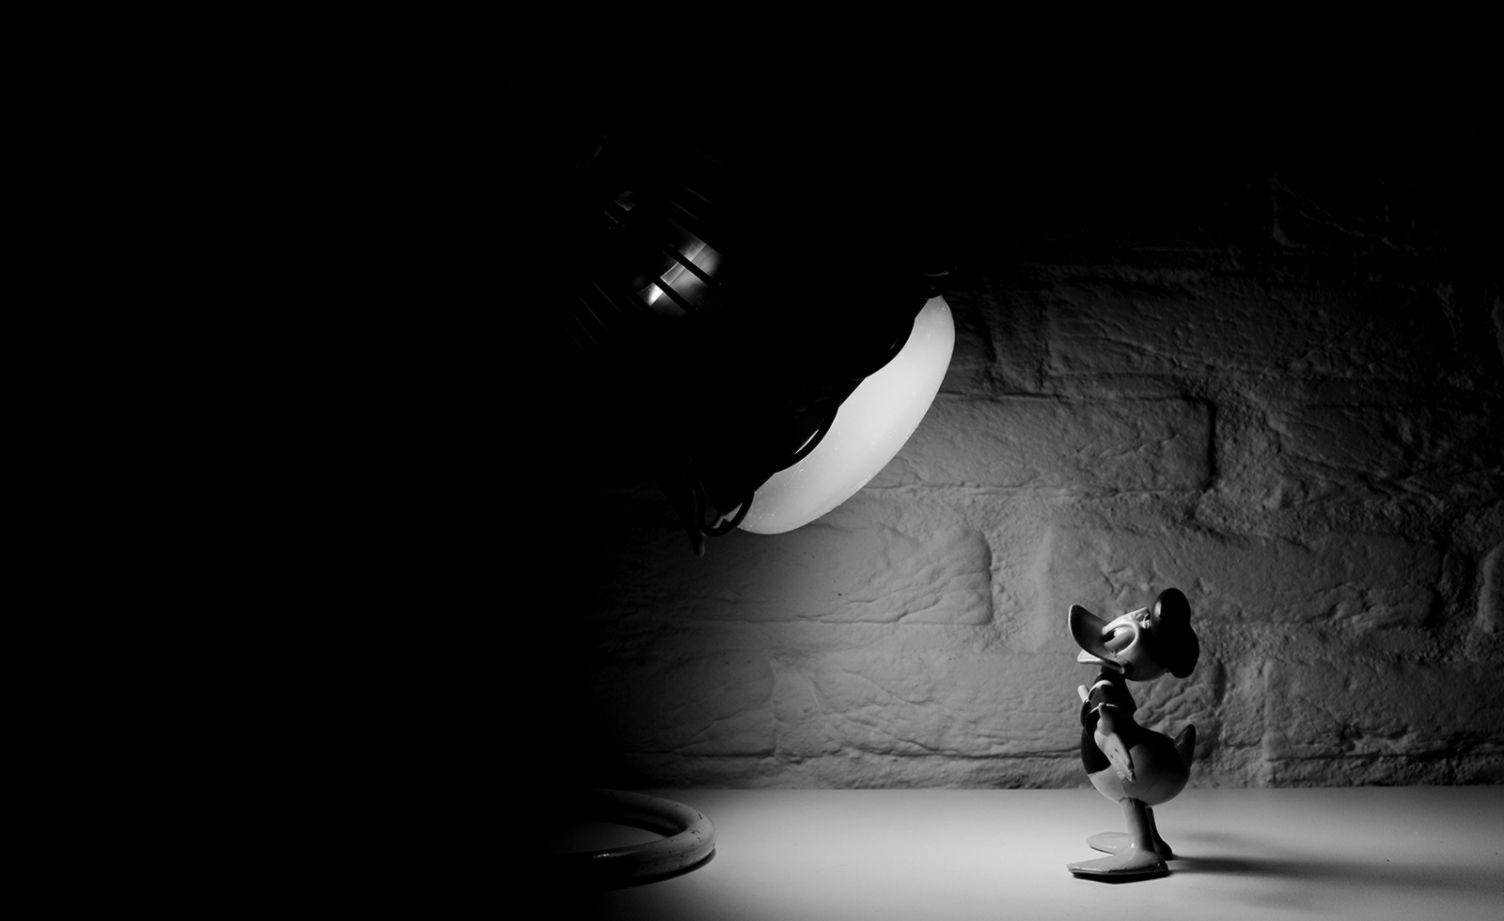 Black And White Cartoon Donald Duck Spotlight Hd Grayscale